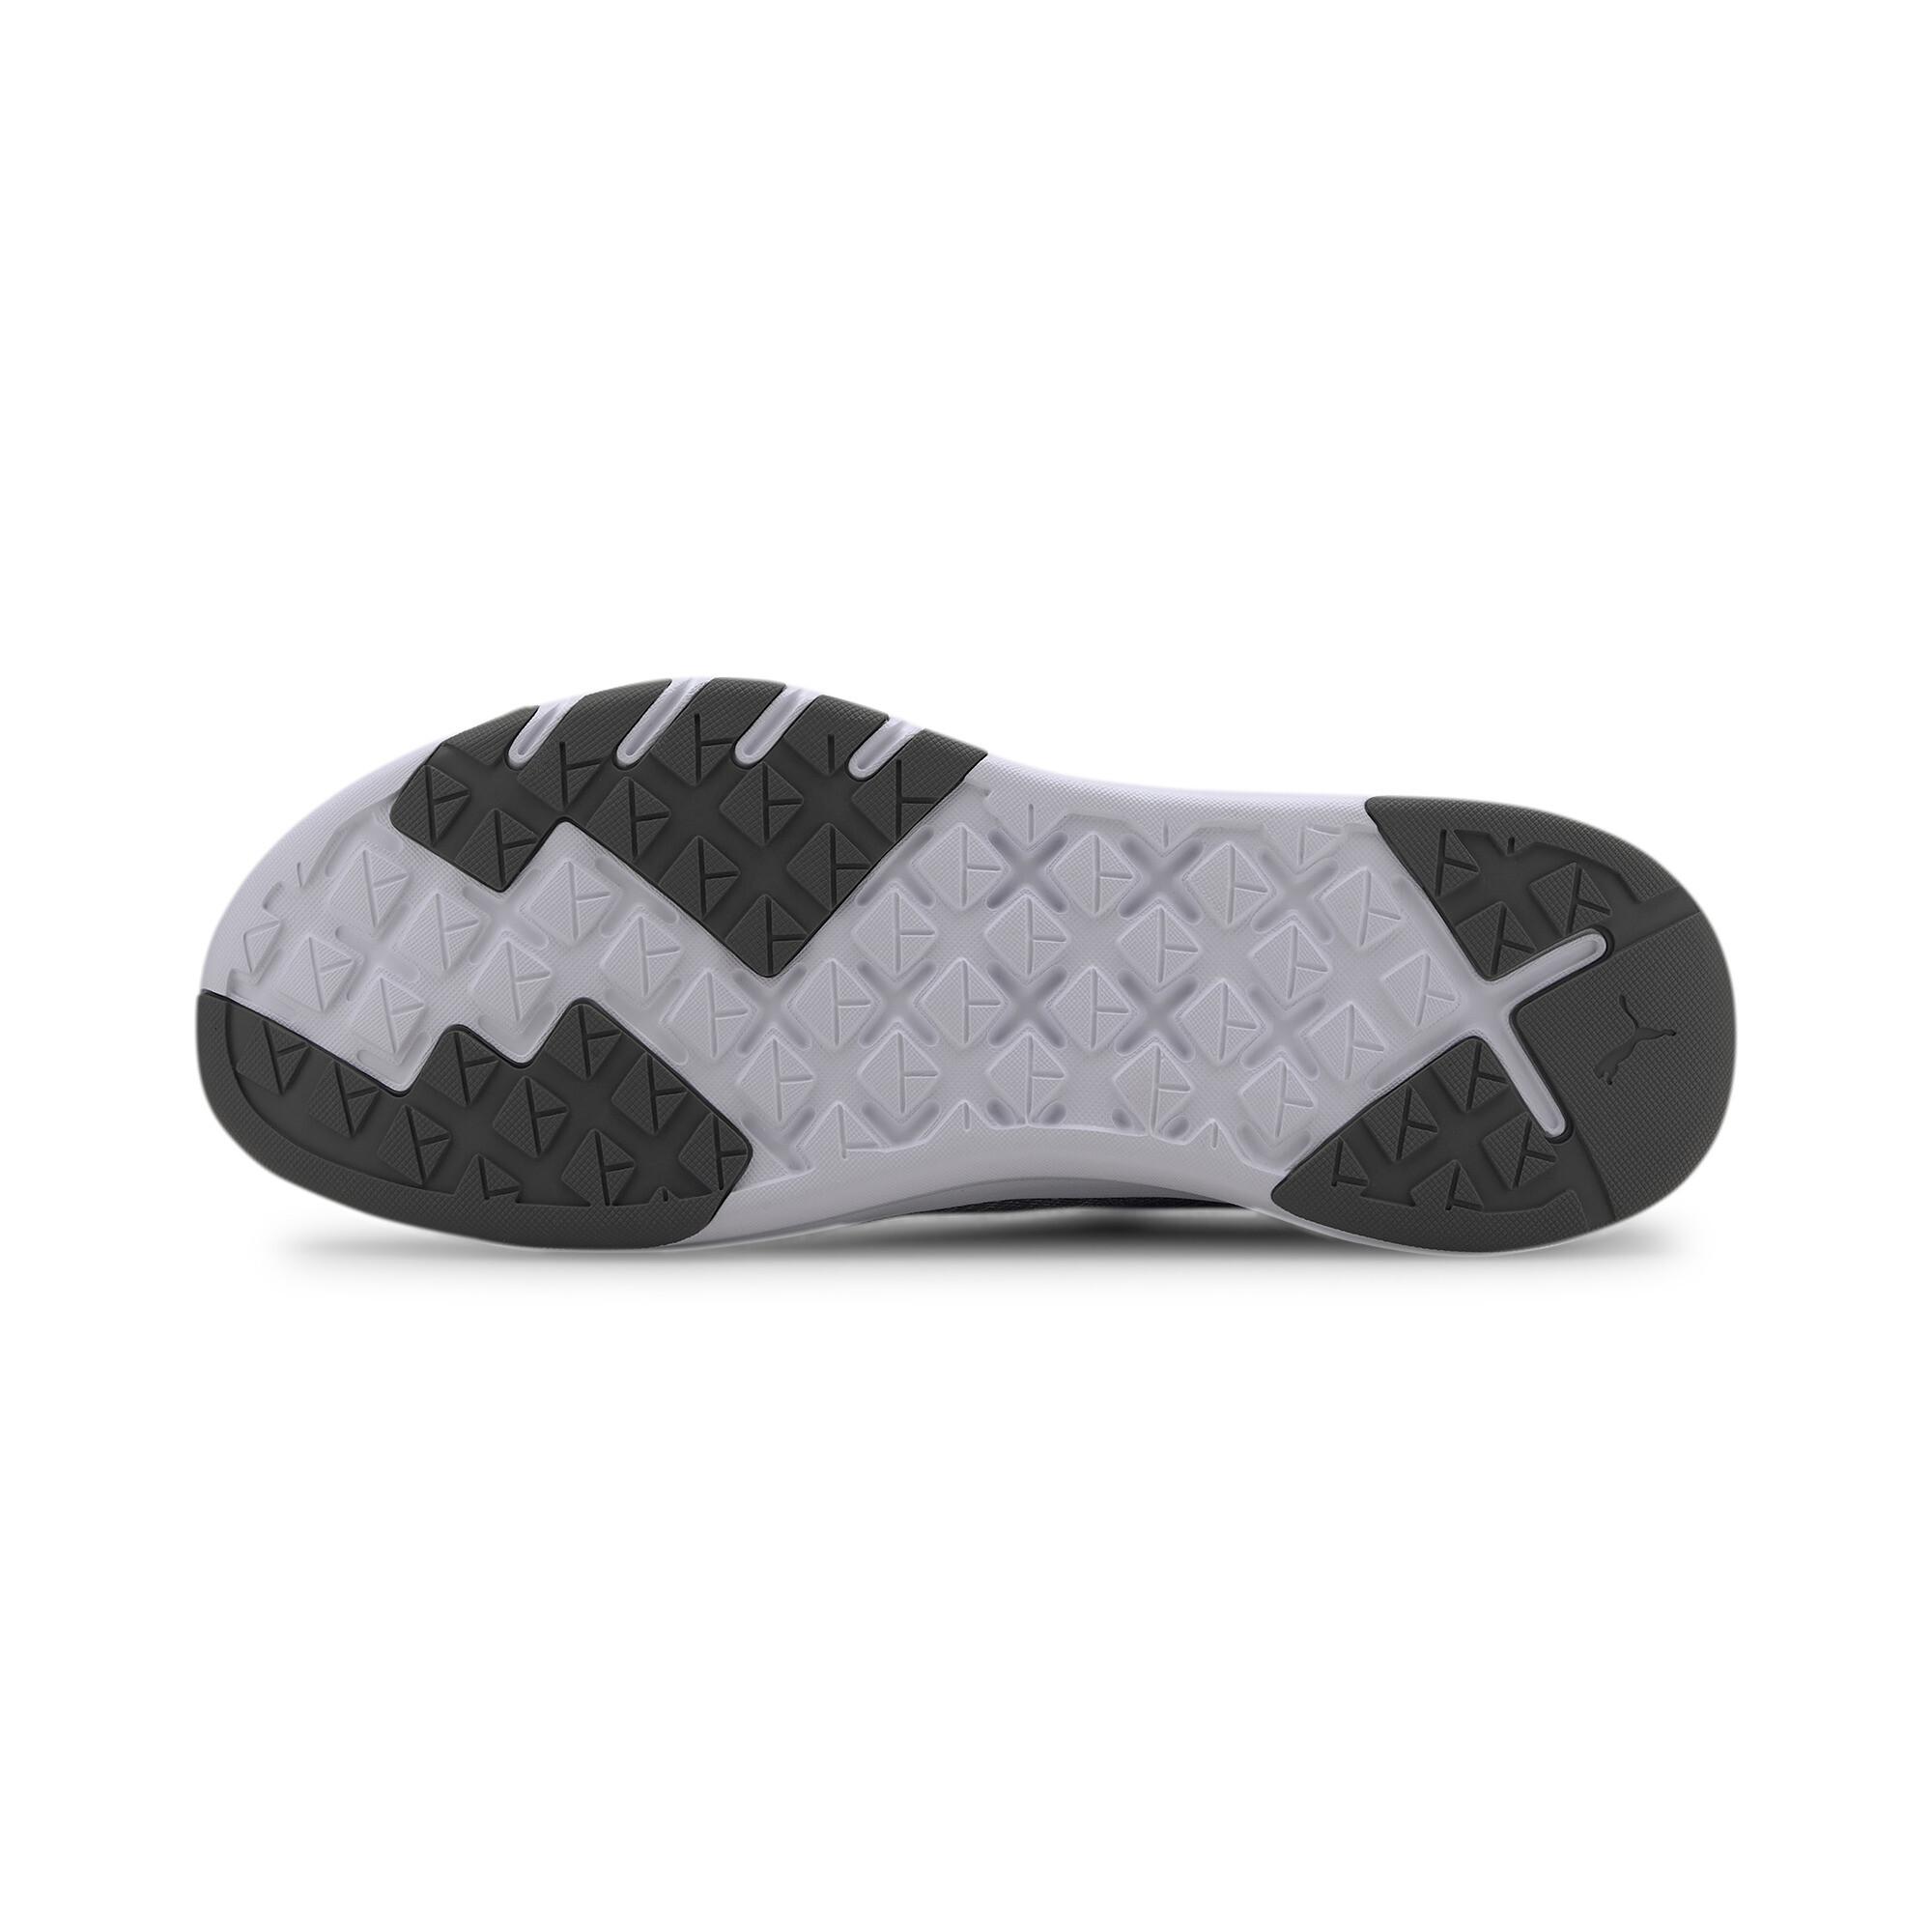 PUMA-Men-039-s-IGNITE-Contender-Knit-Running-Shoes thumbnail 6